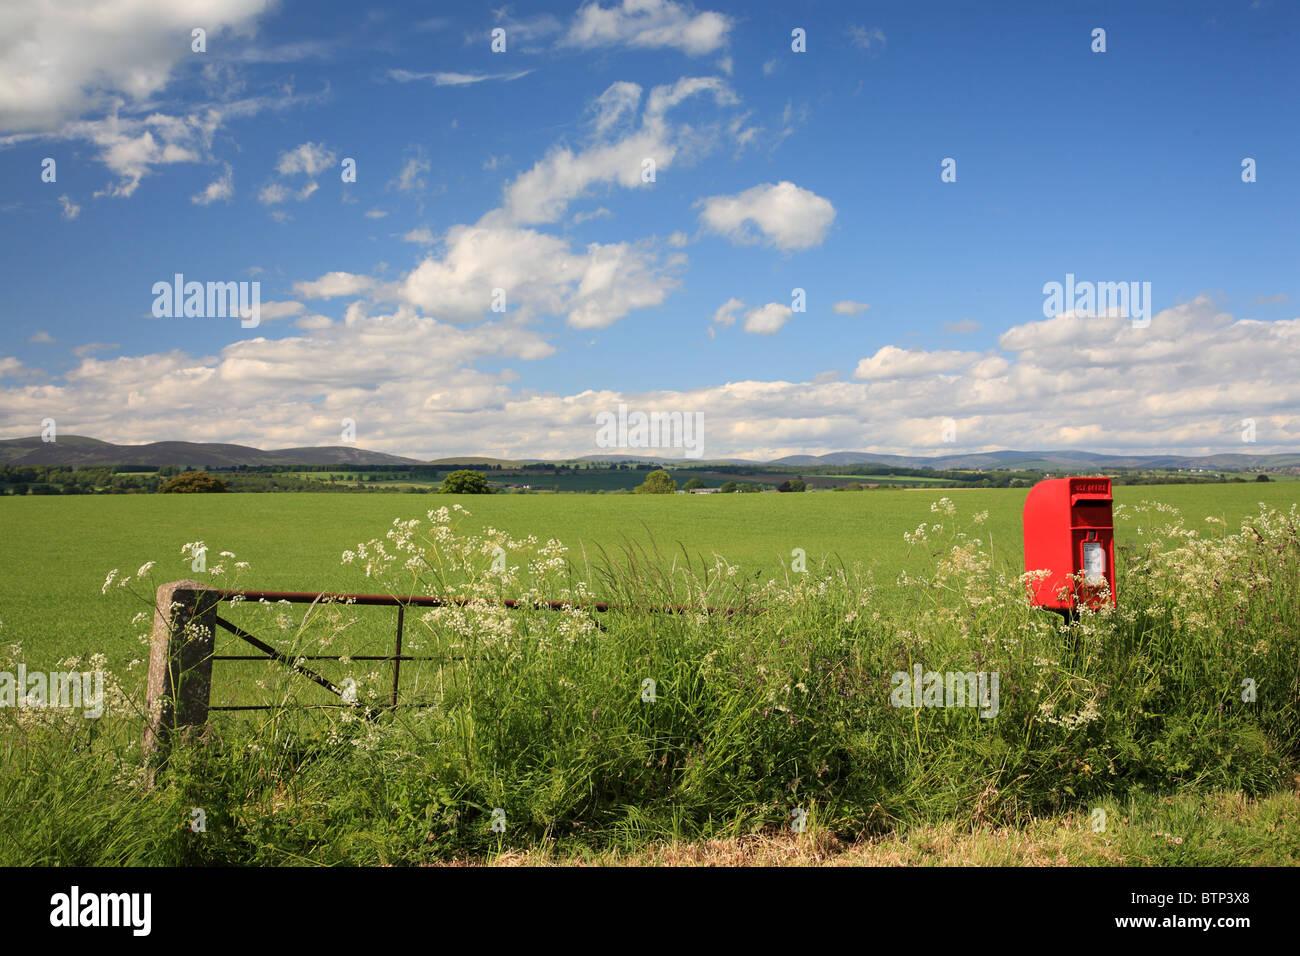 Uk Scotland Tayside Angus Old Post Box And Farm Fields Stock Photo Alamy